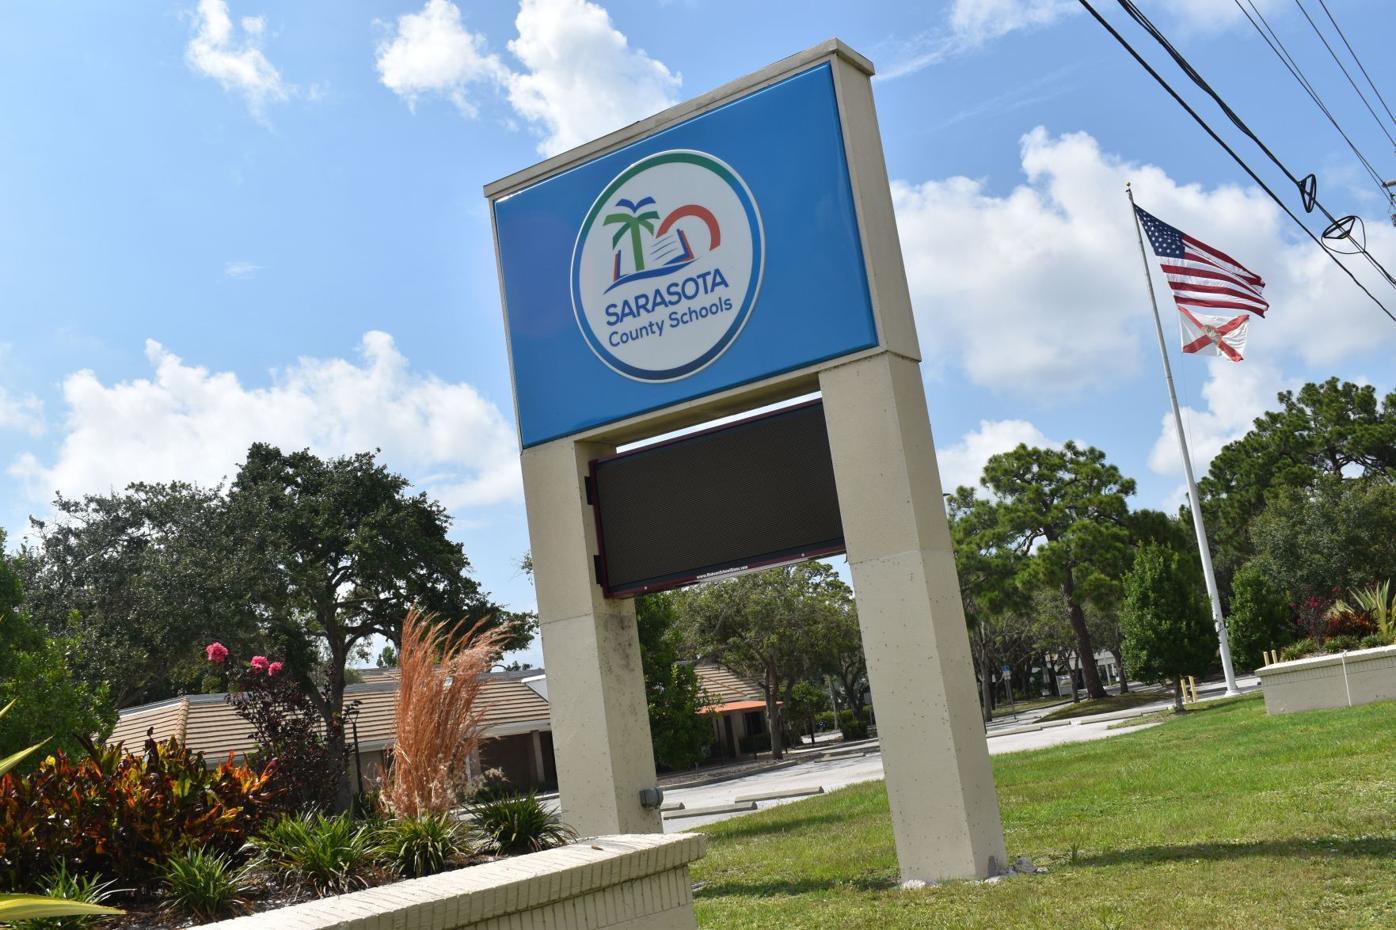 Sarasota County Schools 2020 b.jpg